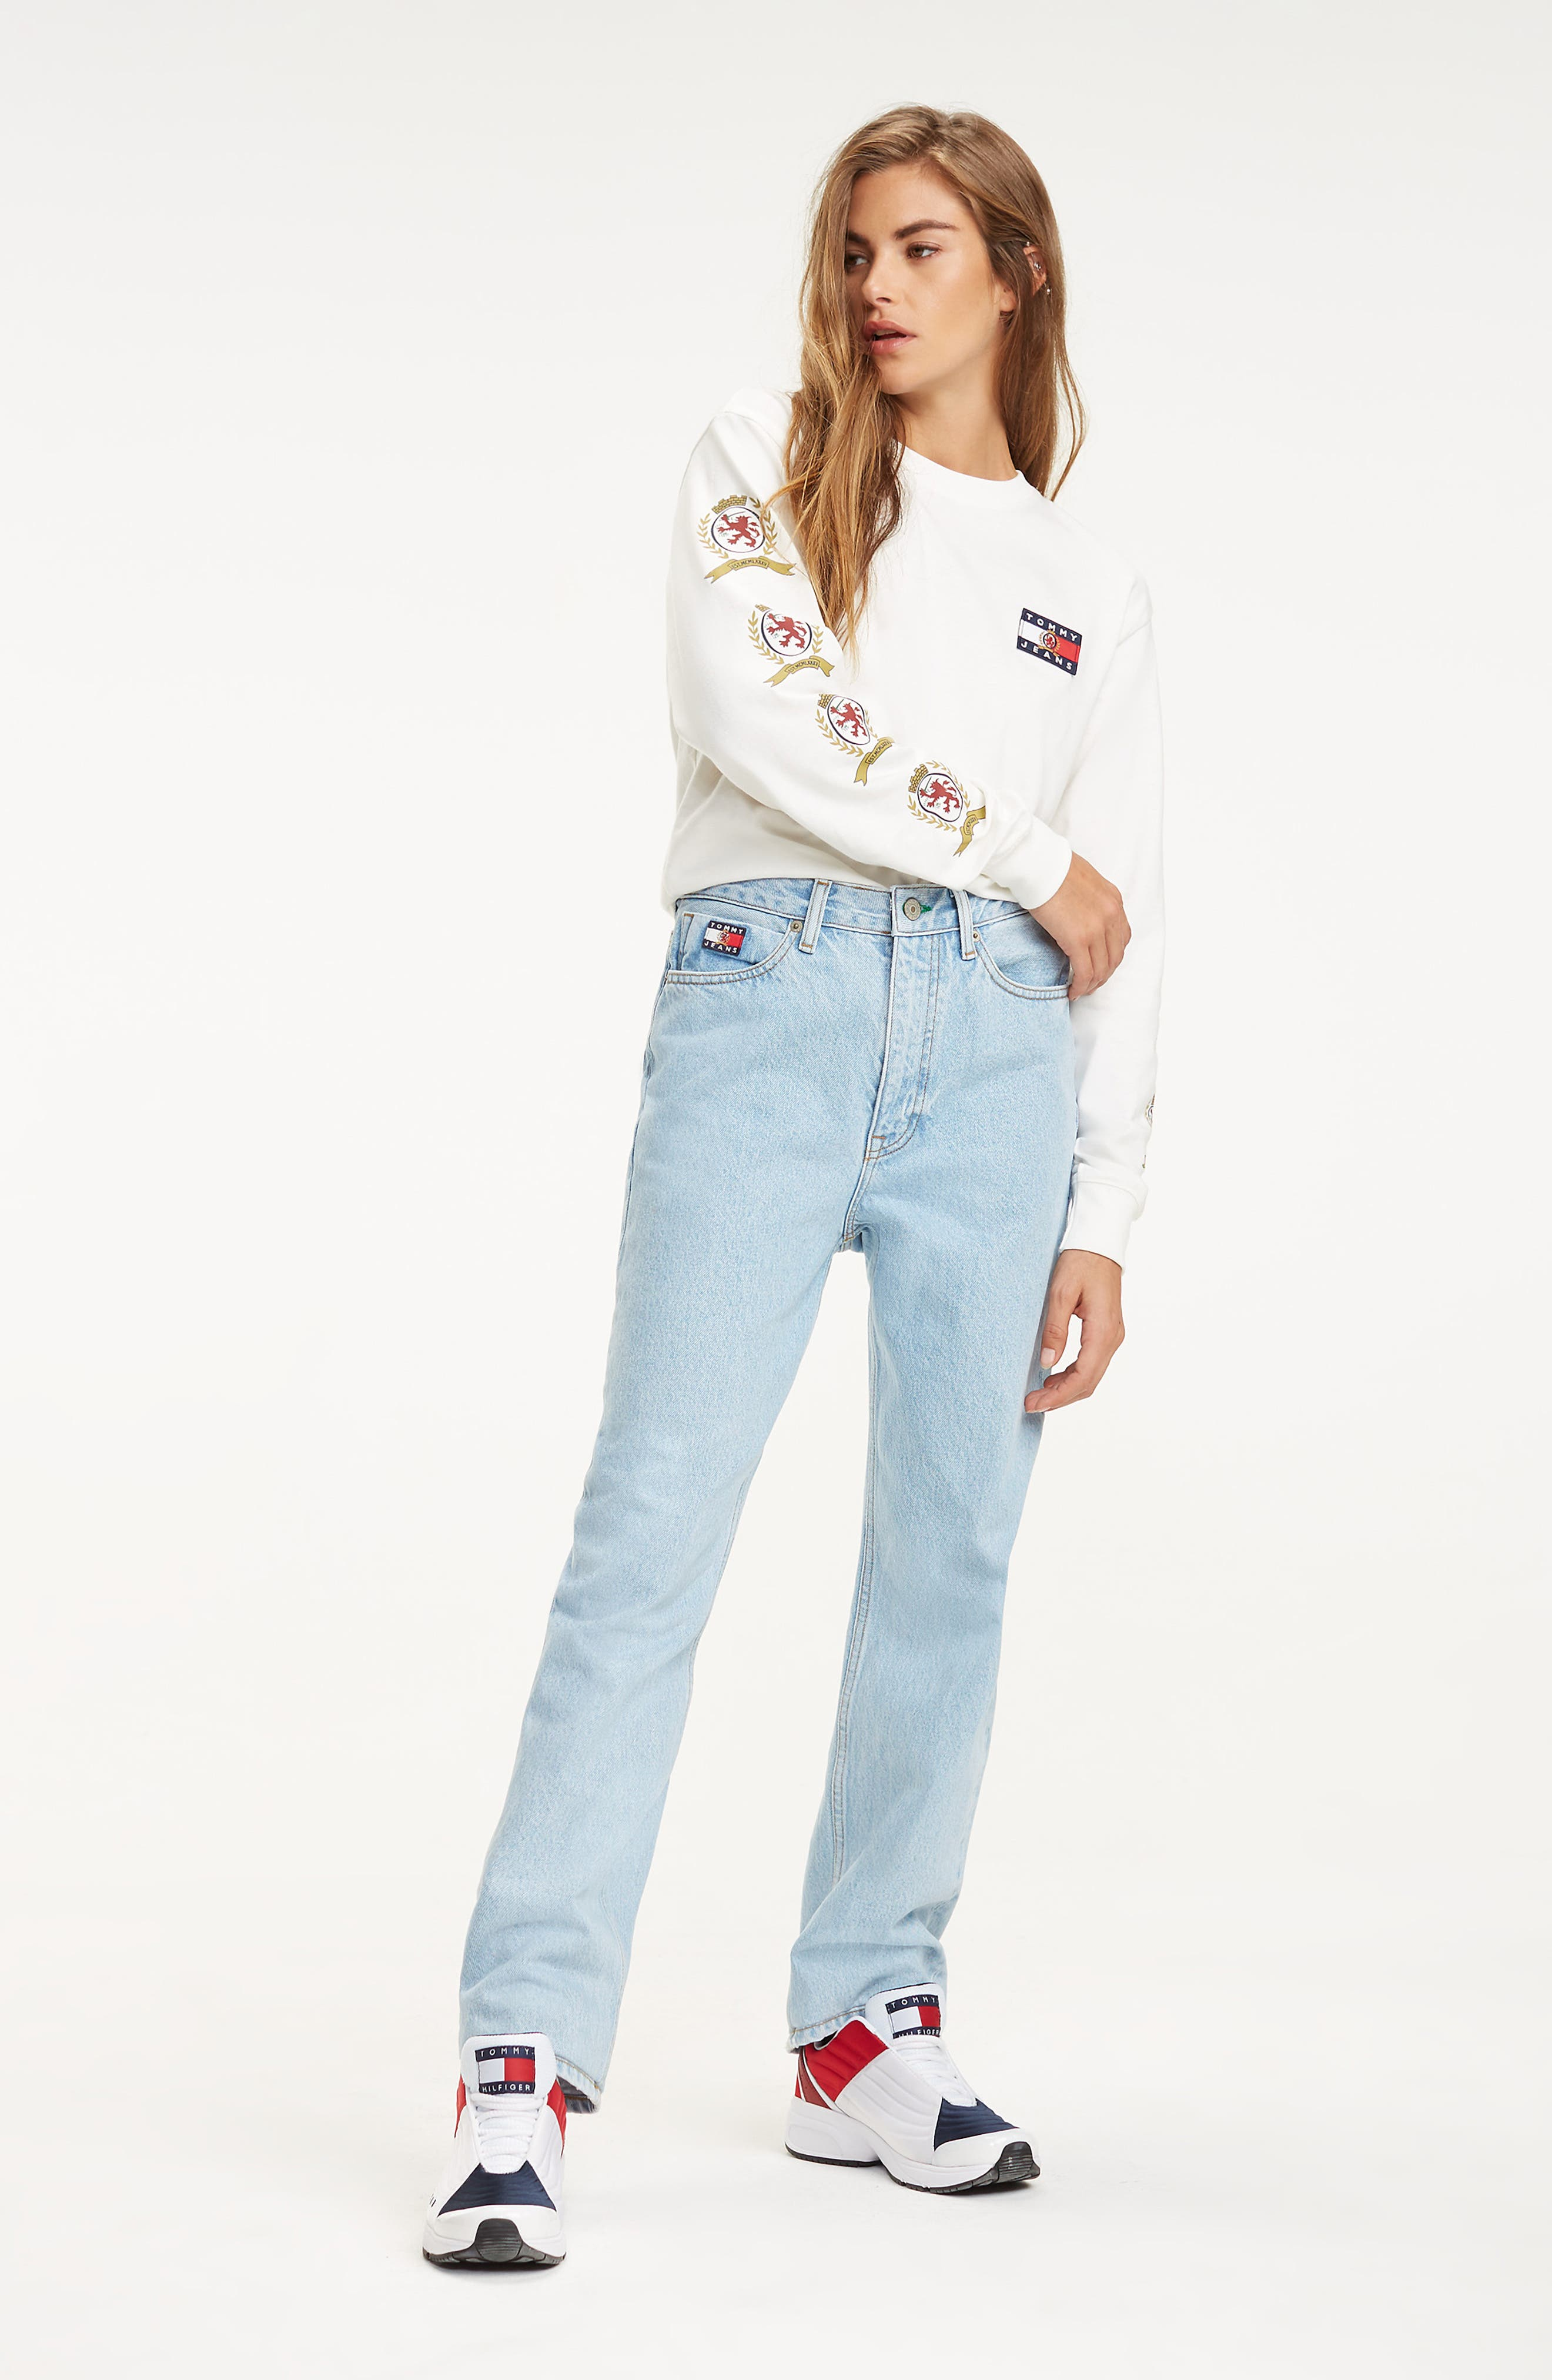 Crest Capsule Mom Jeans,                             Alternate thumbnail 5, color,                             LIGHT BLUE DENIM